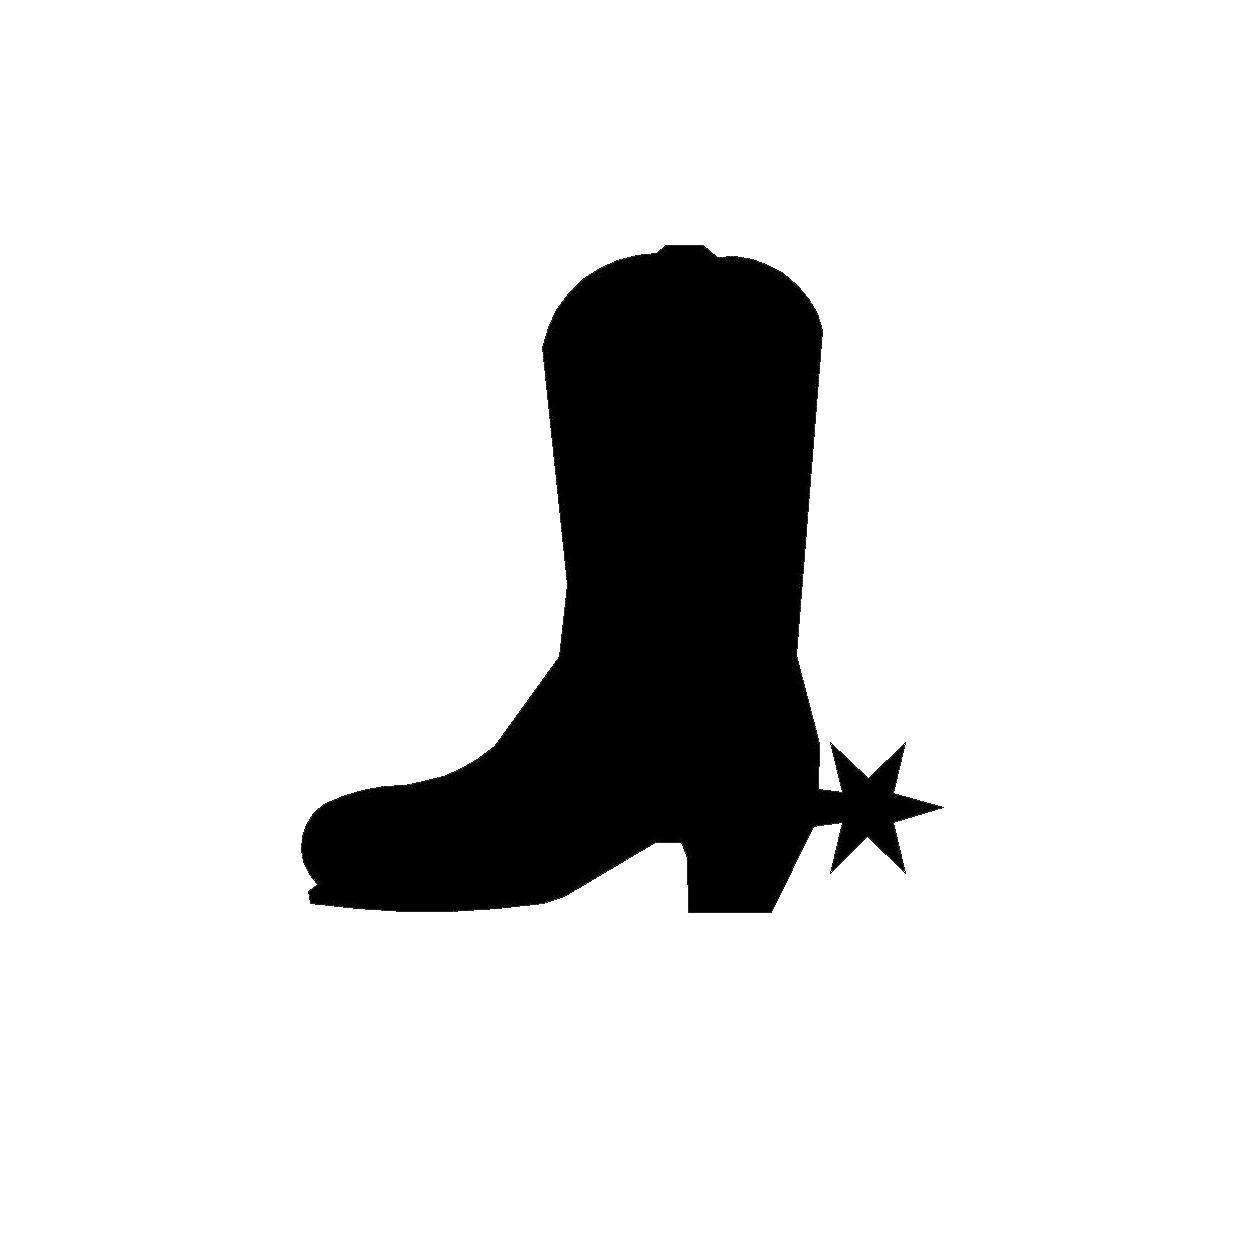 1260x1260 Hd Cute Cowboy Boots Clipart Boot Silhouette Clip Art Image